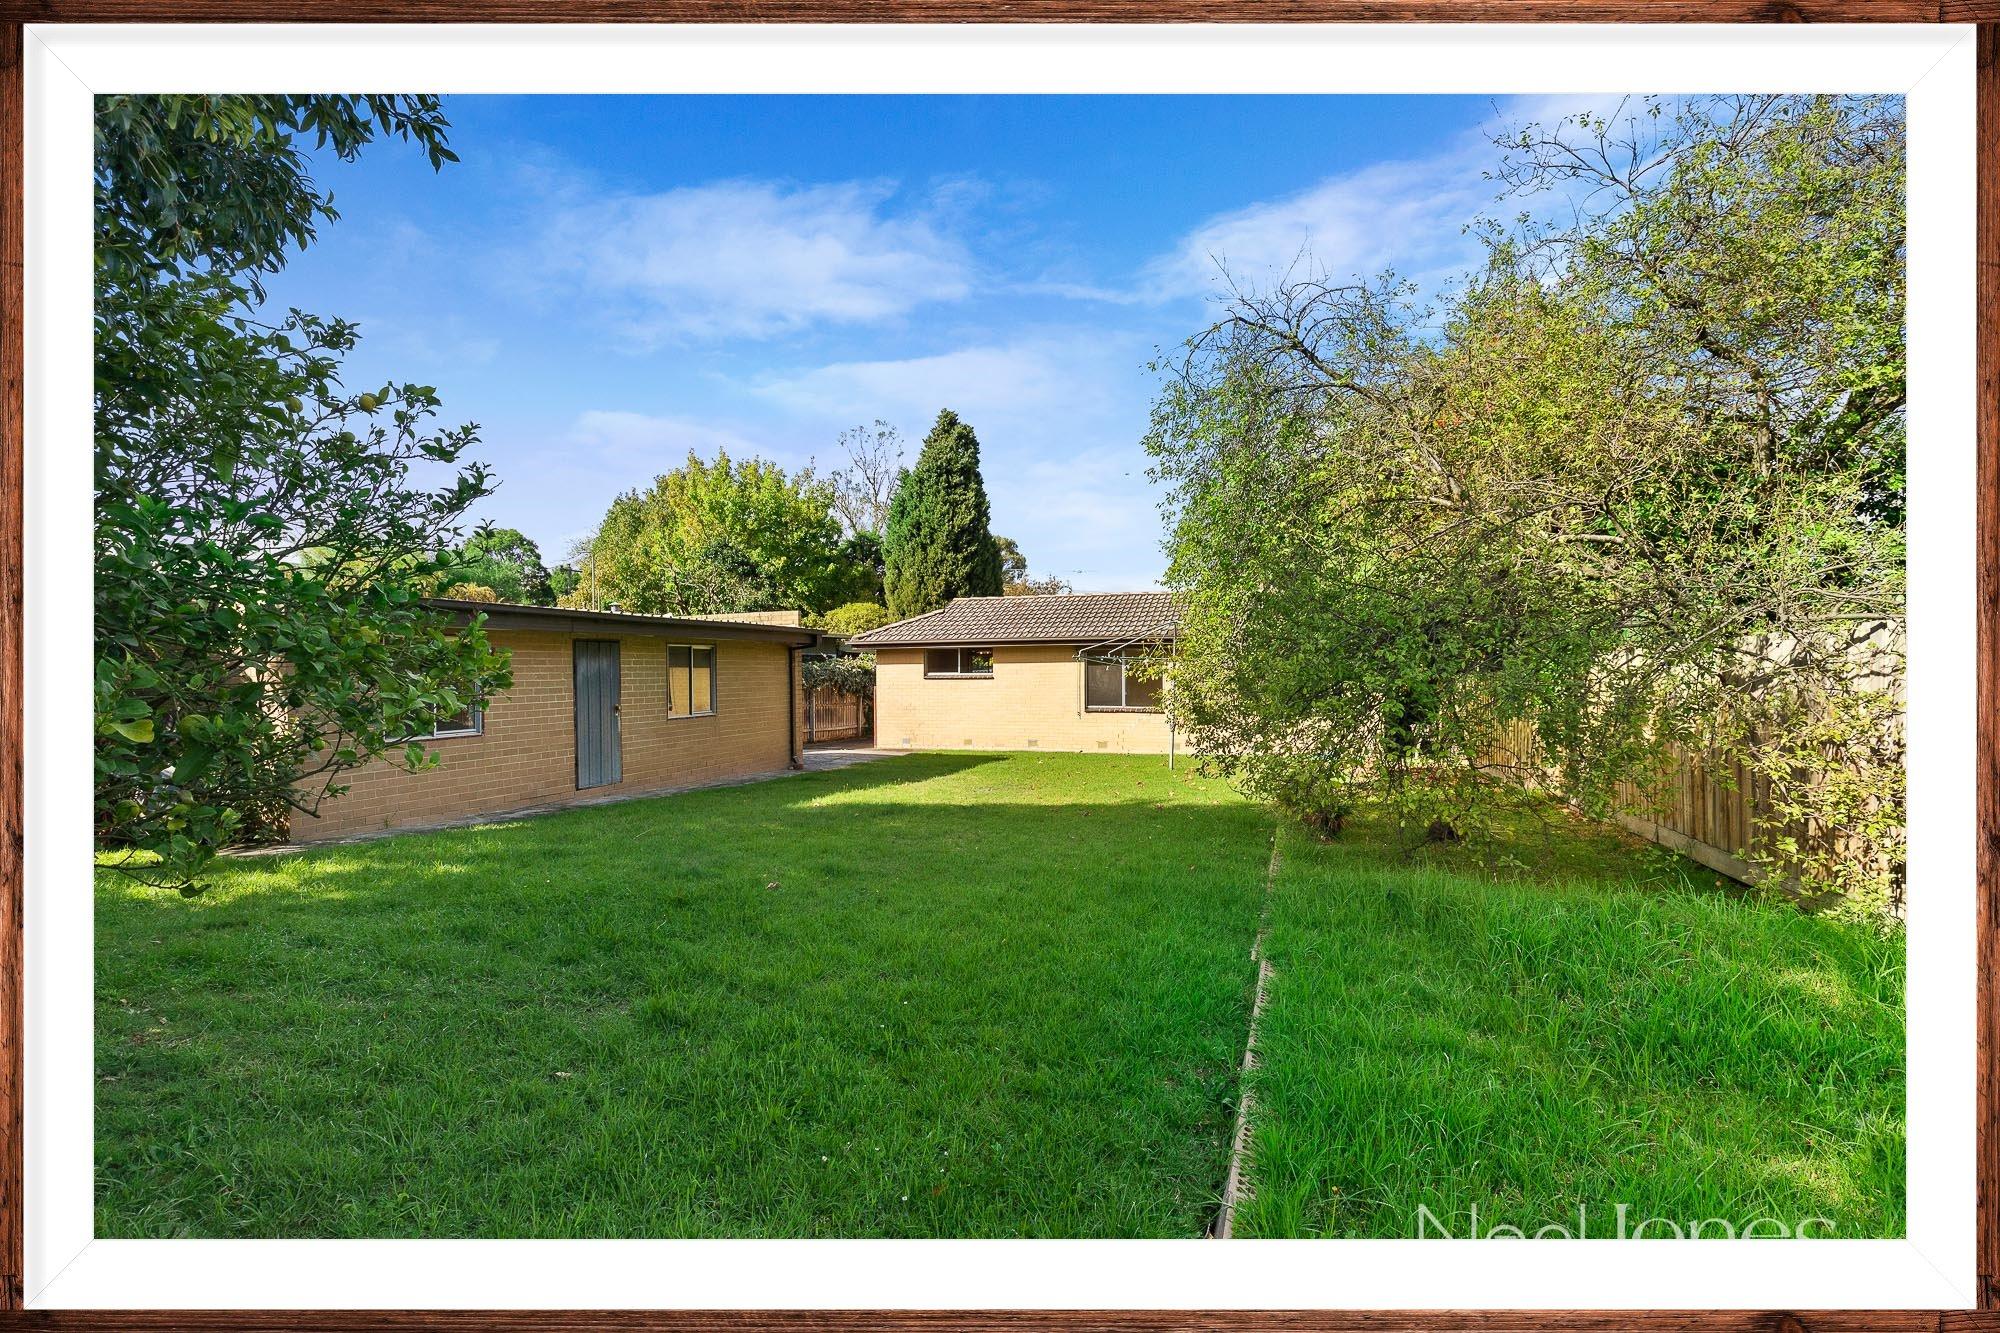 Property - House for sale, 107 Rooks Road, Mitcham, VIC 3132, Melbourne, Australia. Estate Agent - Noel Jones.